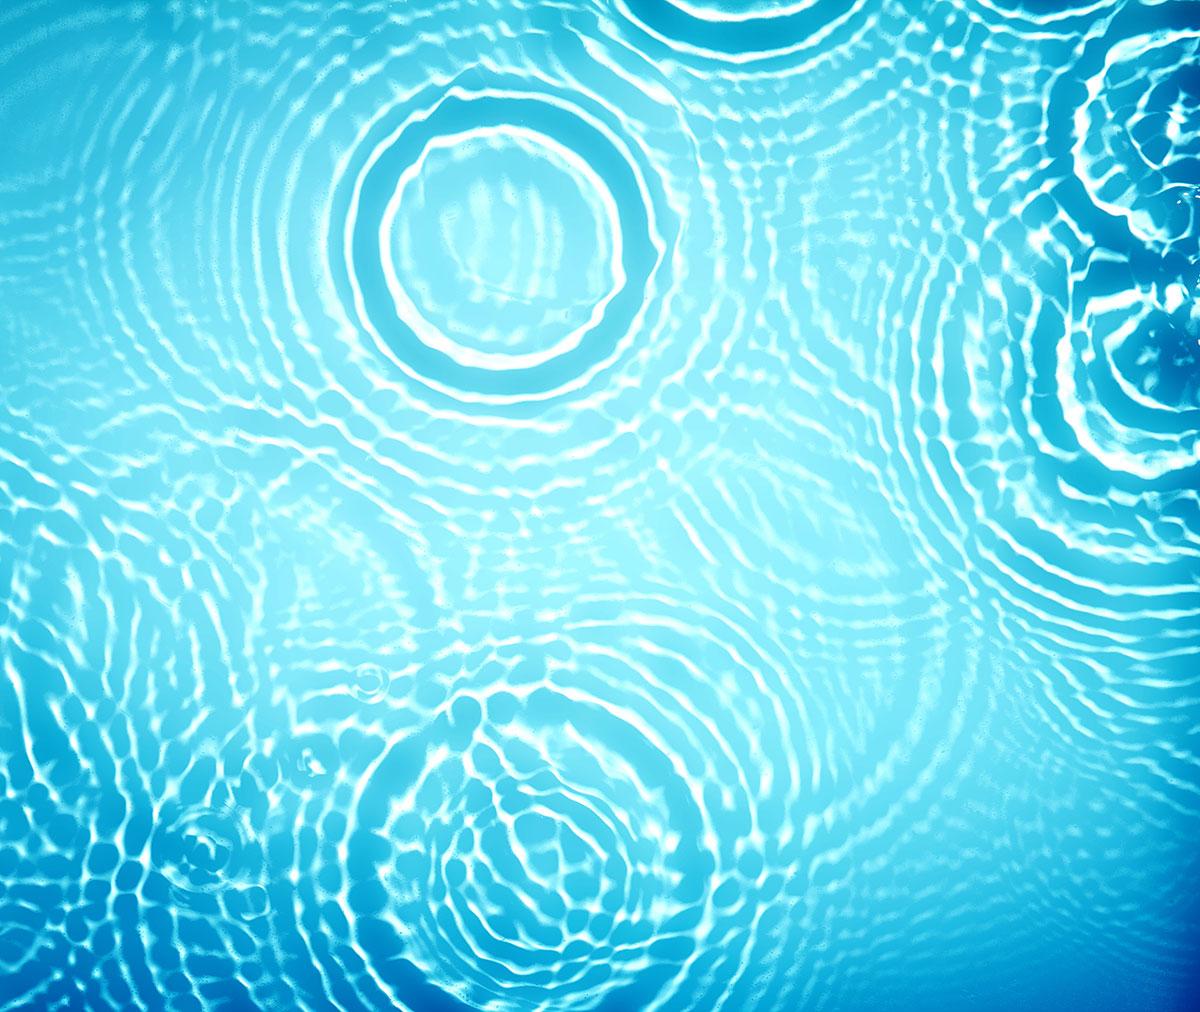 circle-water-ripple-1200.jpg